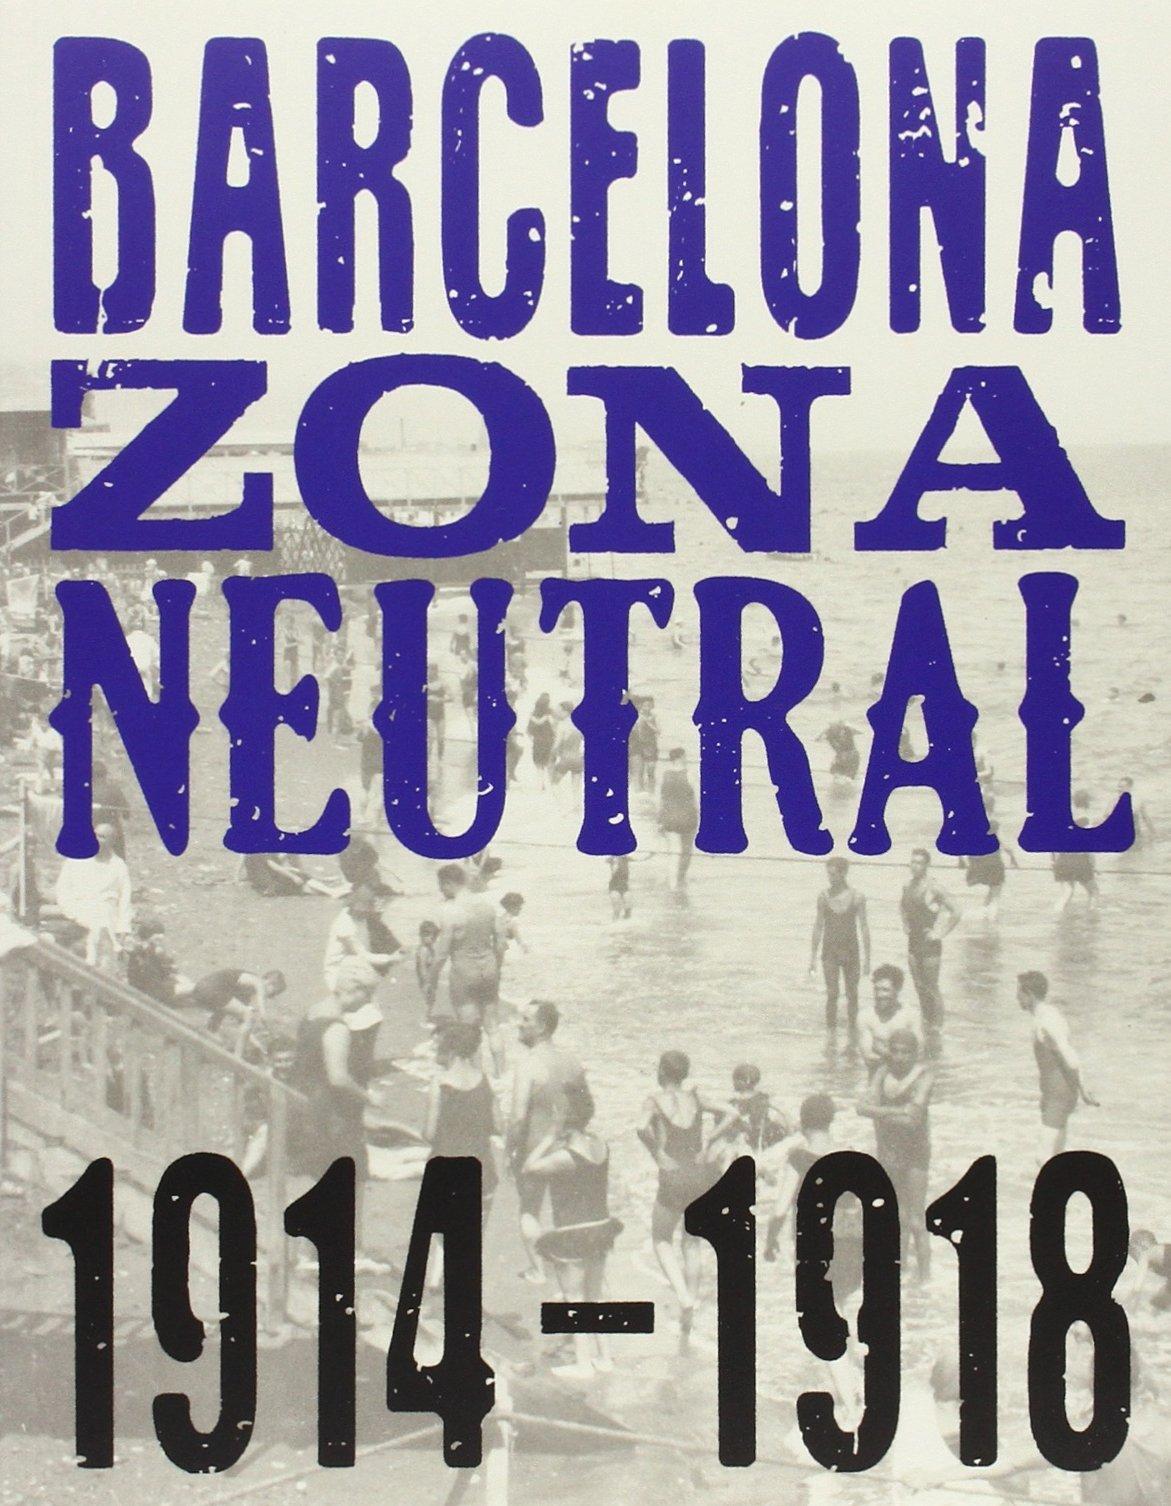 Barcelona Zona Neutral 1914 1918 Fanes Felix Minguet Joan M 9788494253577 Amazon Com Books